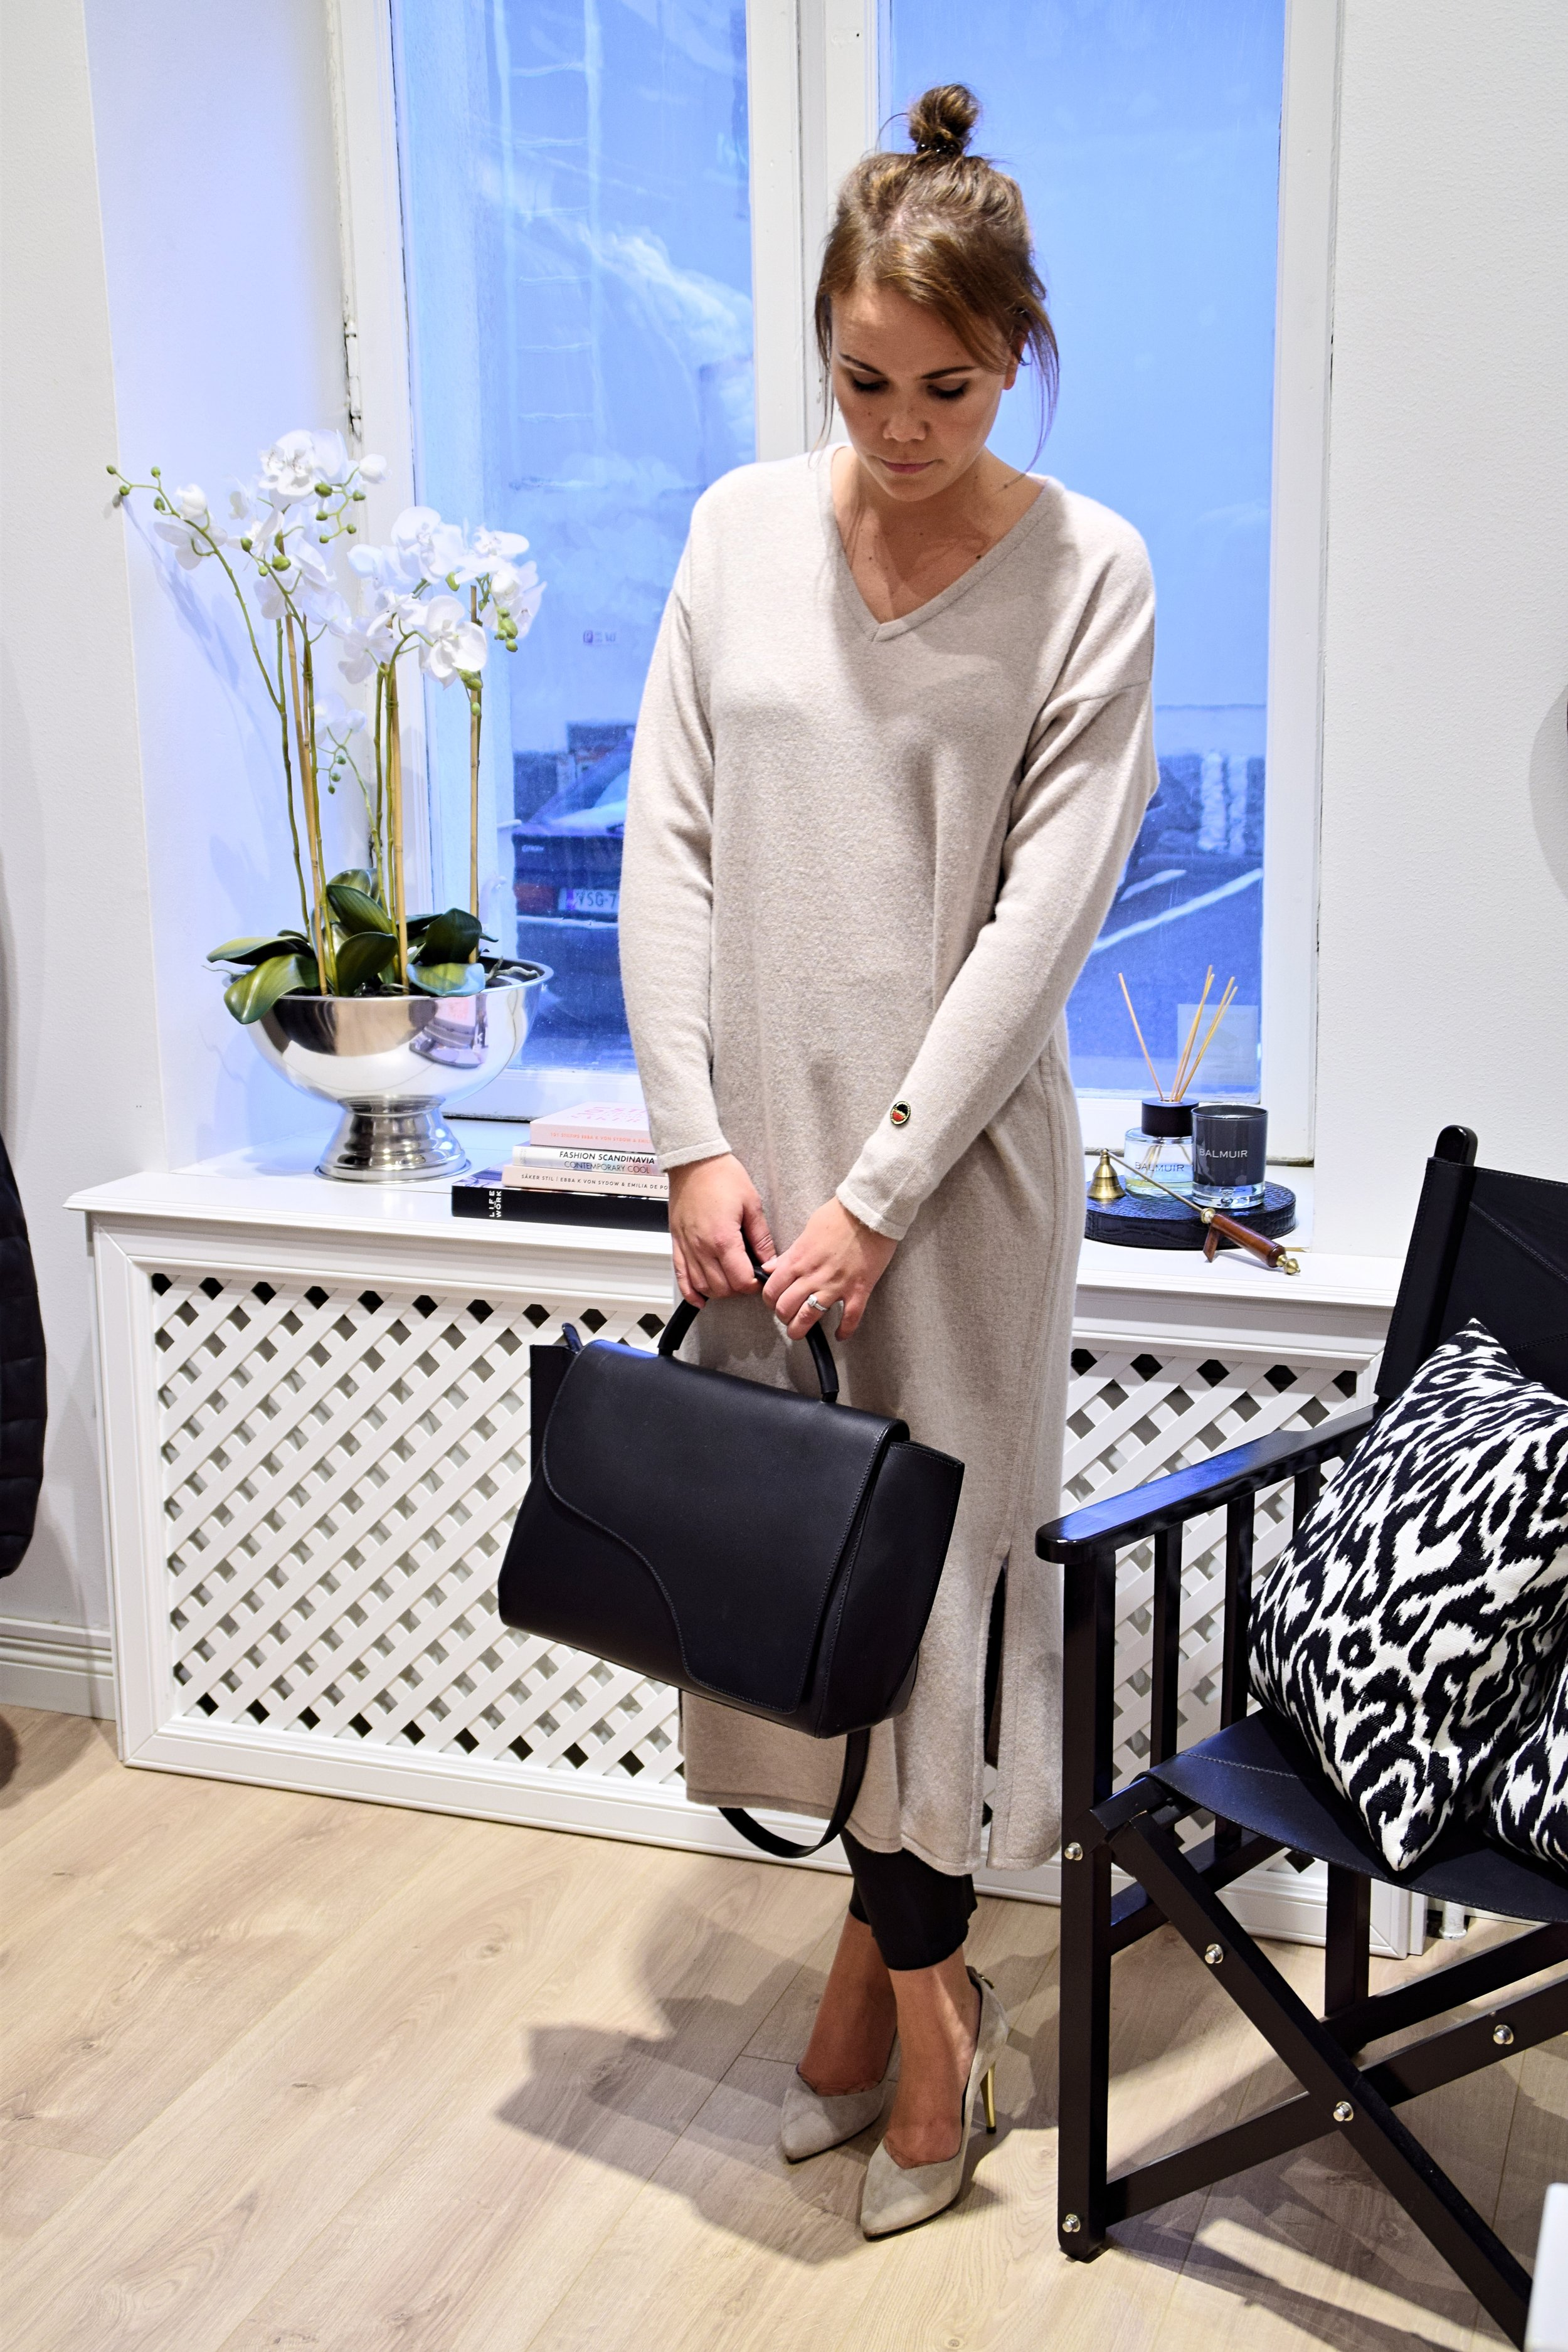 Gráces Dress, Busnel                     Leather Pants, By Malene Birger / Bag, ATP Atelier / Shoes, afKlinberg